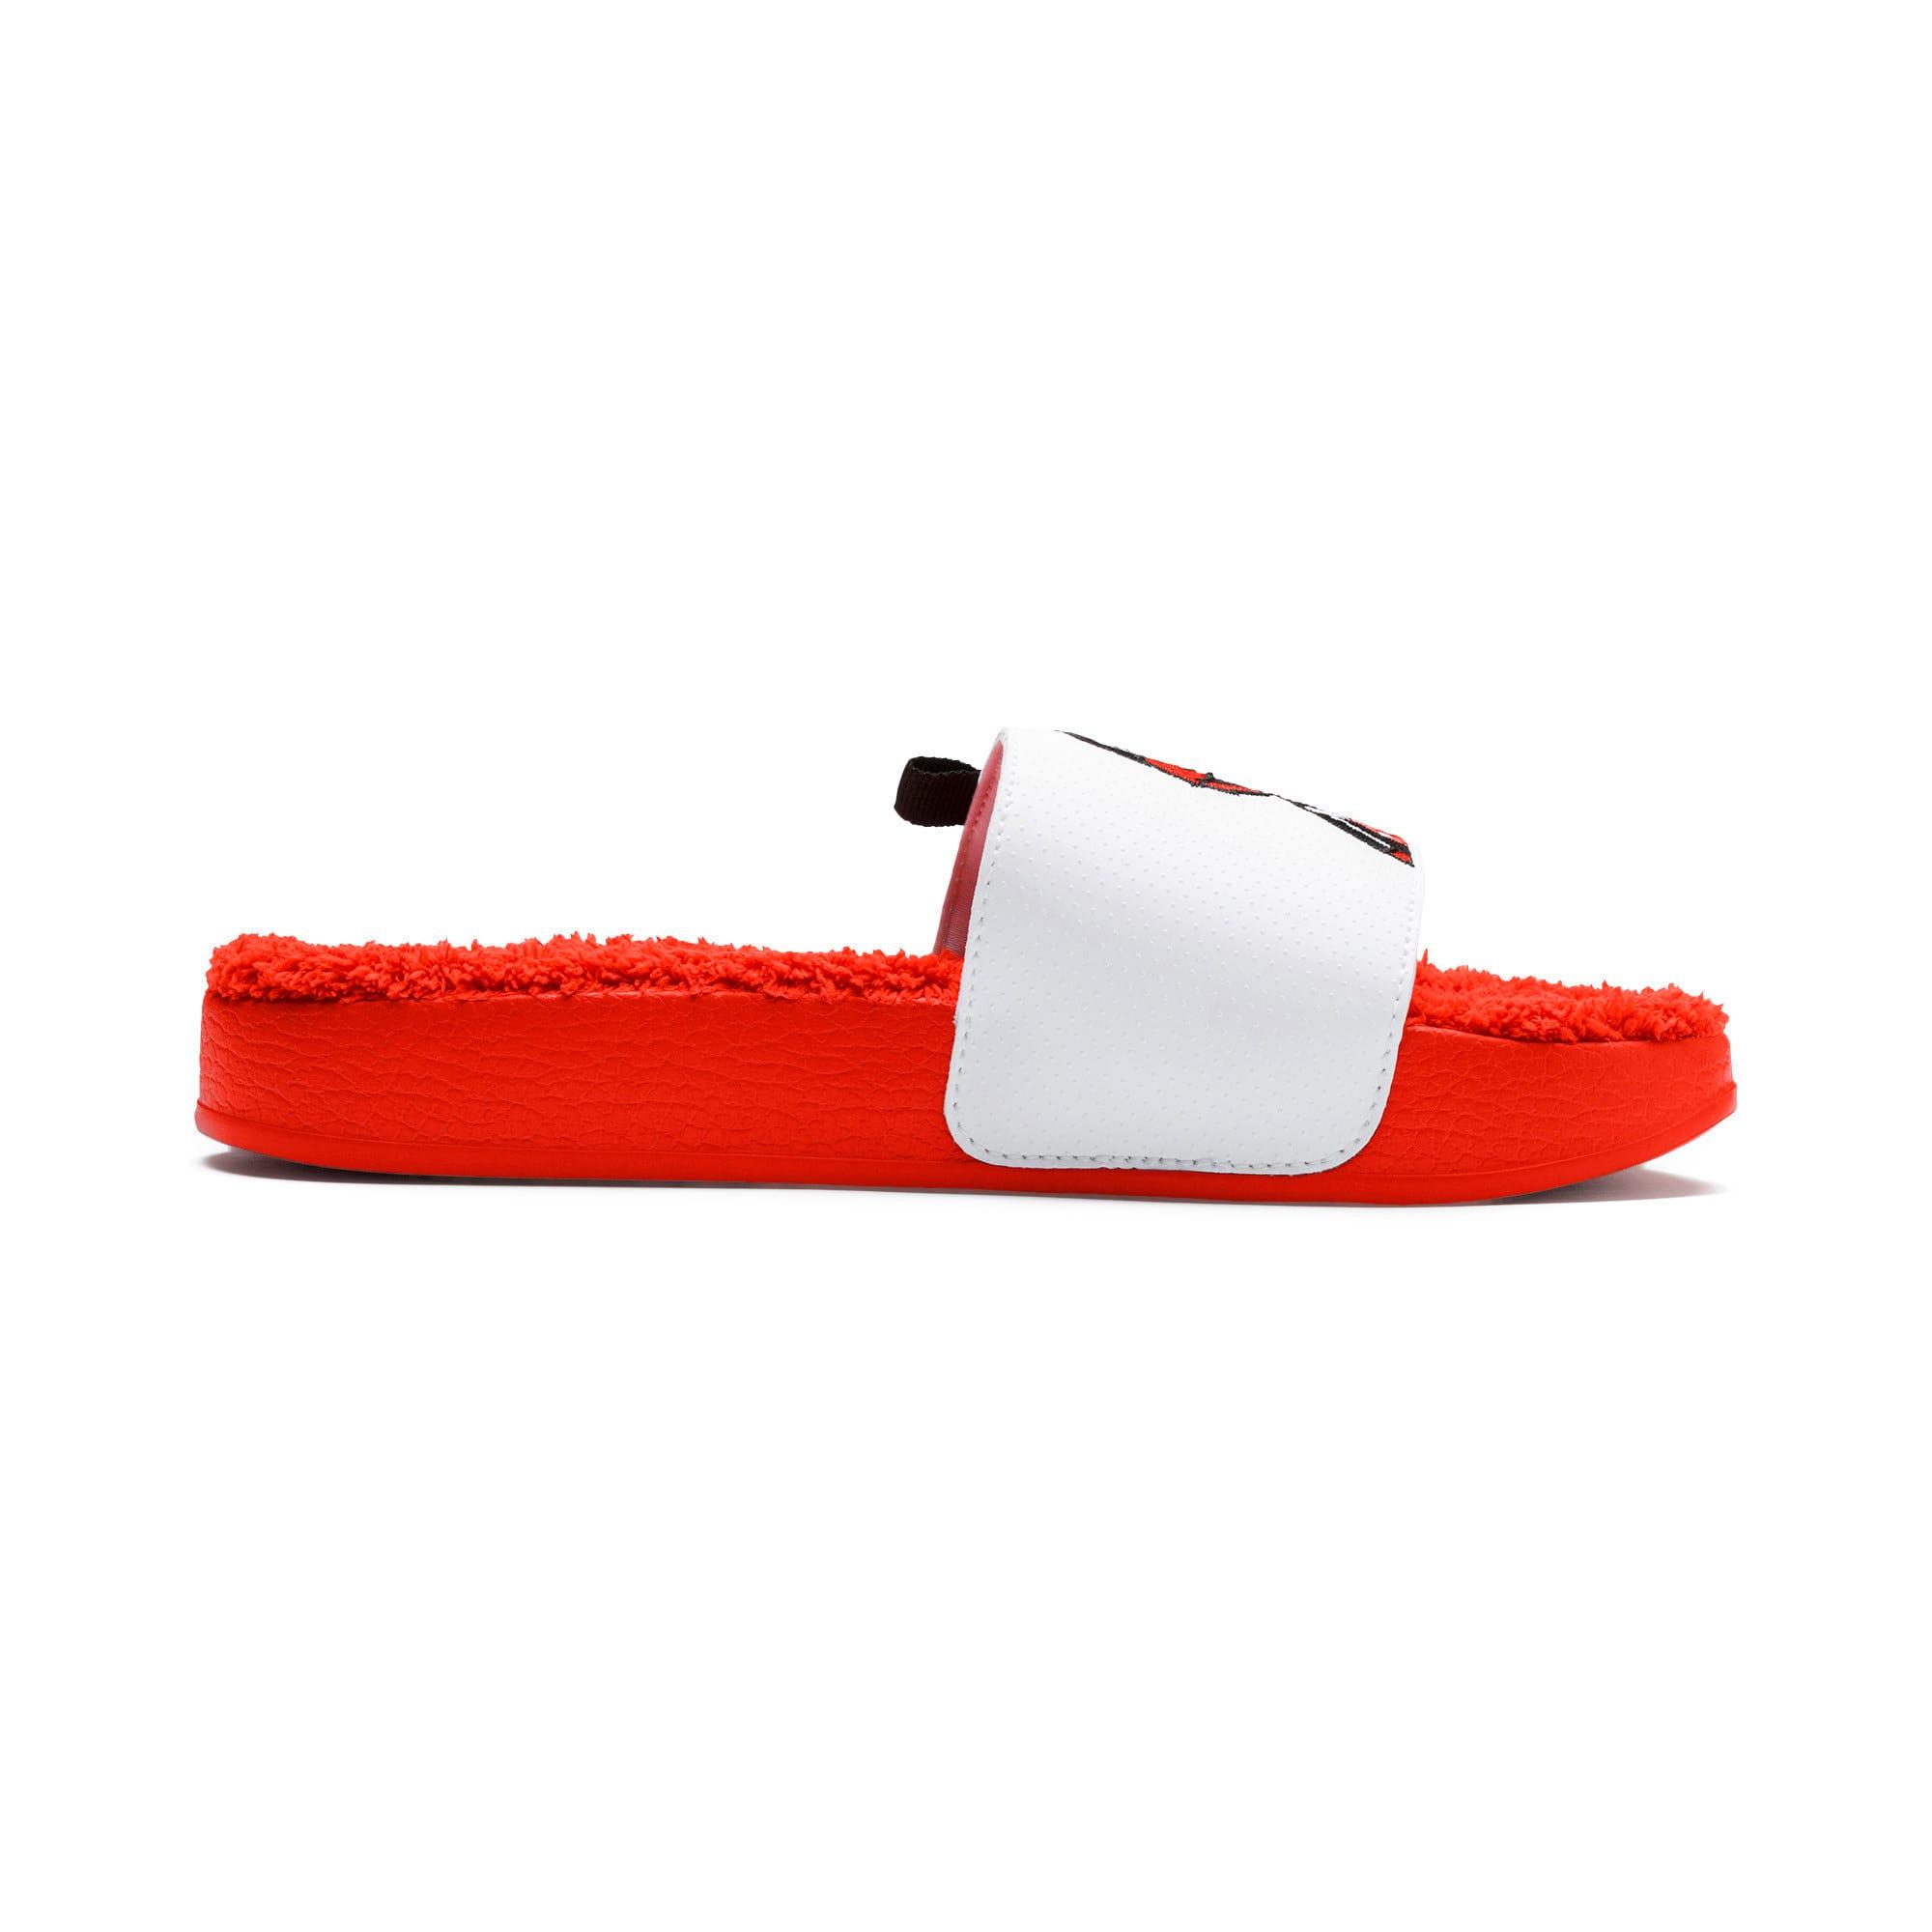 Thumbnail 6 of Sesame Street Kids' Leadcat Sandals, Cherry Tomato-Puma White, medium-IND